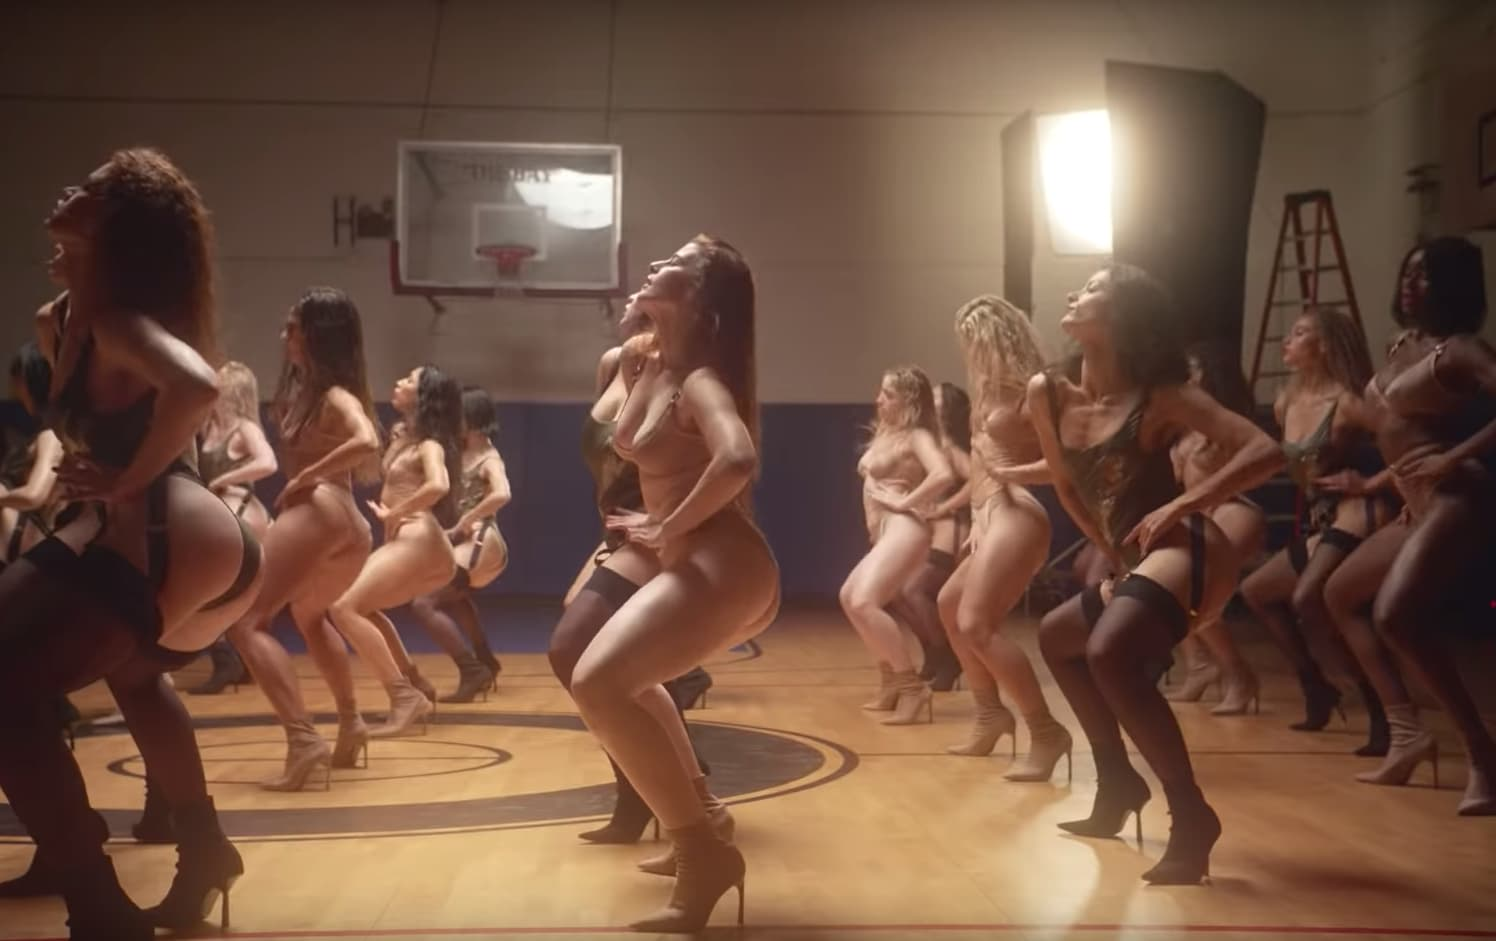 Agent Provocateur läßt starke Frauen zu Pump Up the Jam in Dessous tanzen | Klingt schräg ist aber absolut gelungen